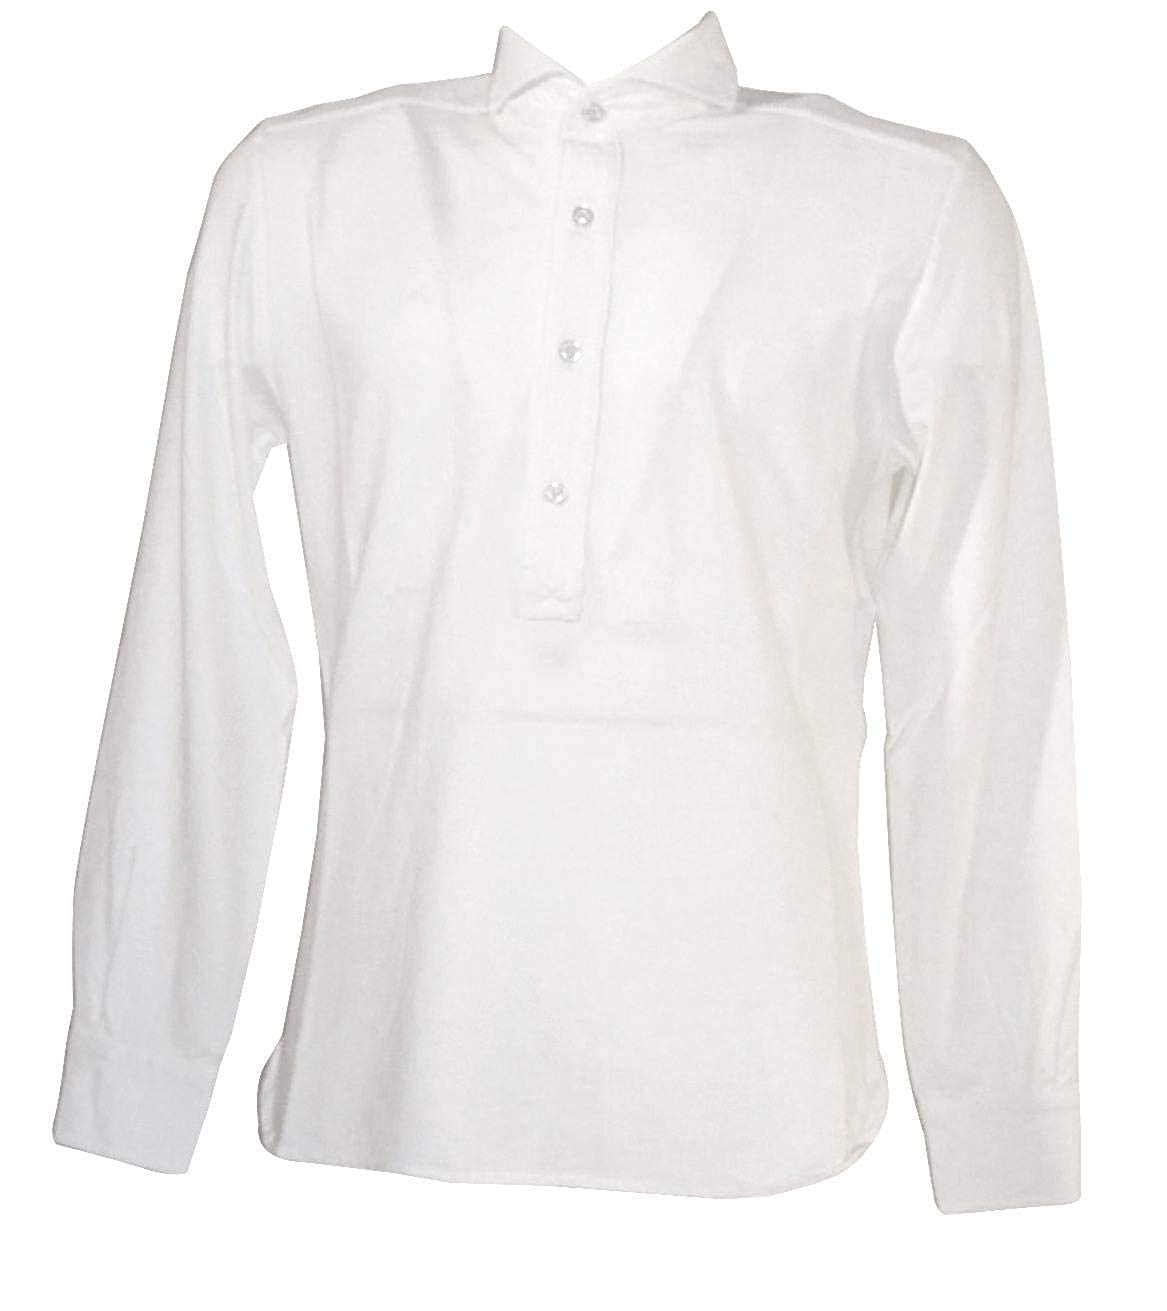 Camicia CcourirA hommes CcourirA cod.CANNES328 blanc Taille 46